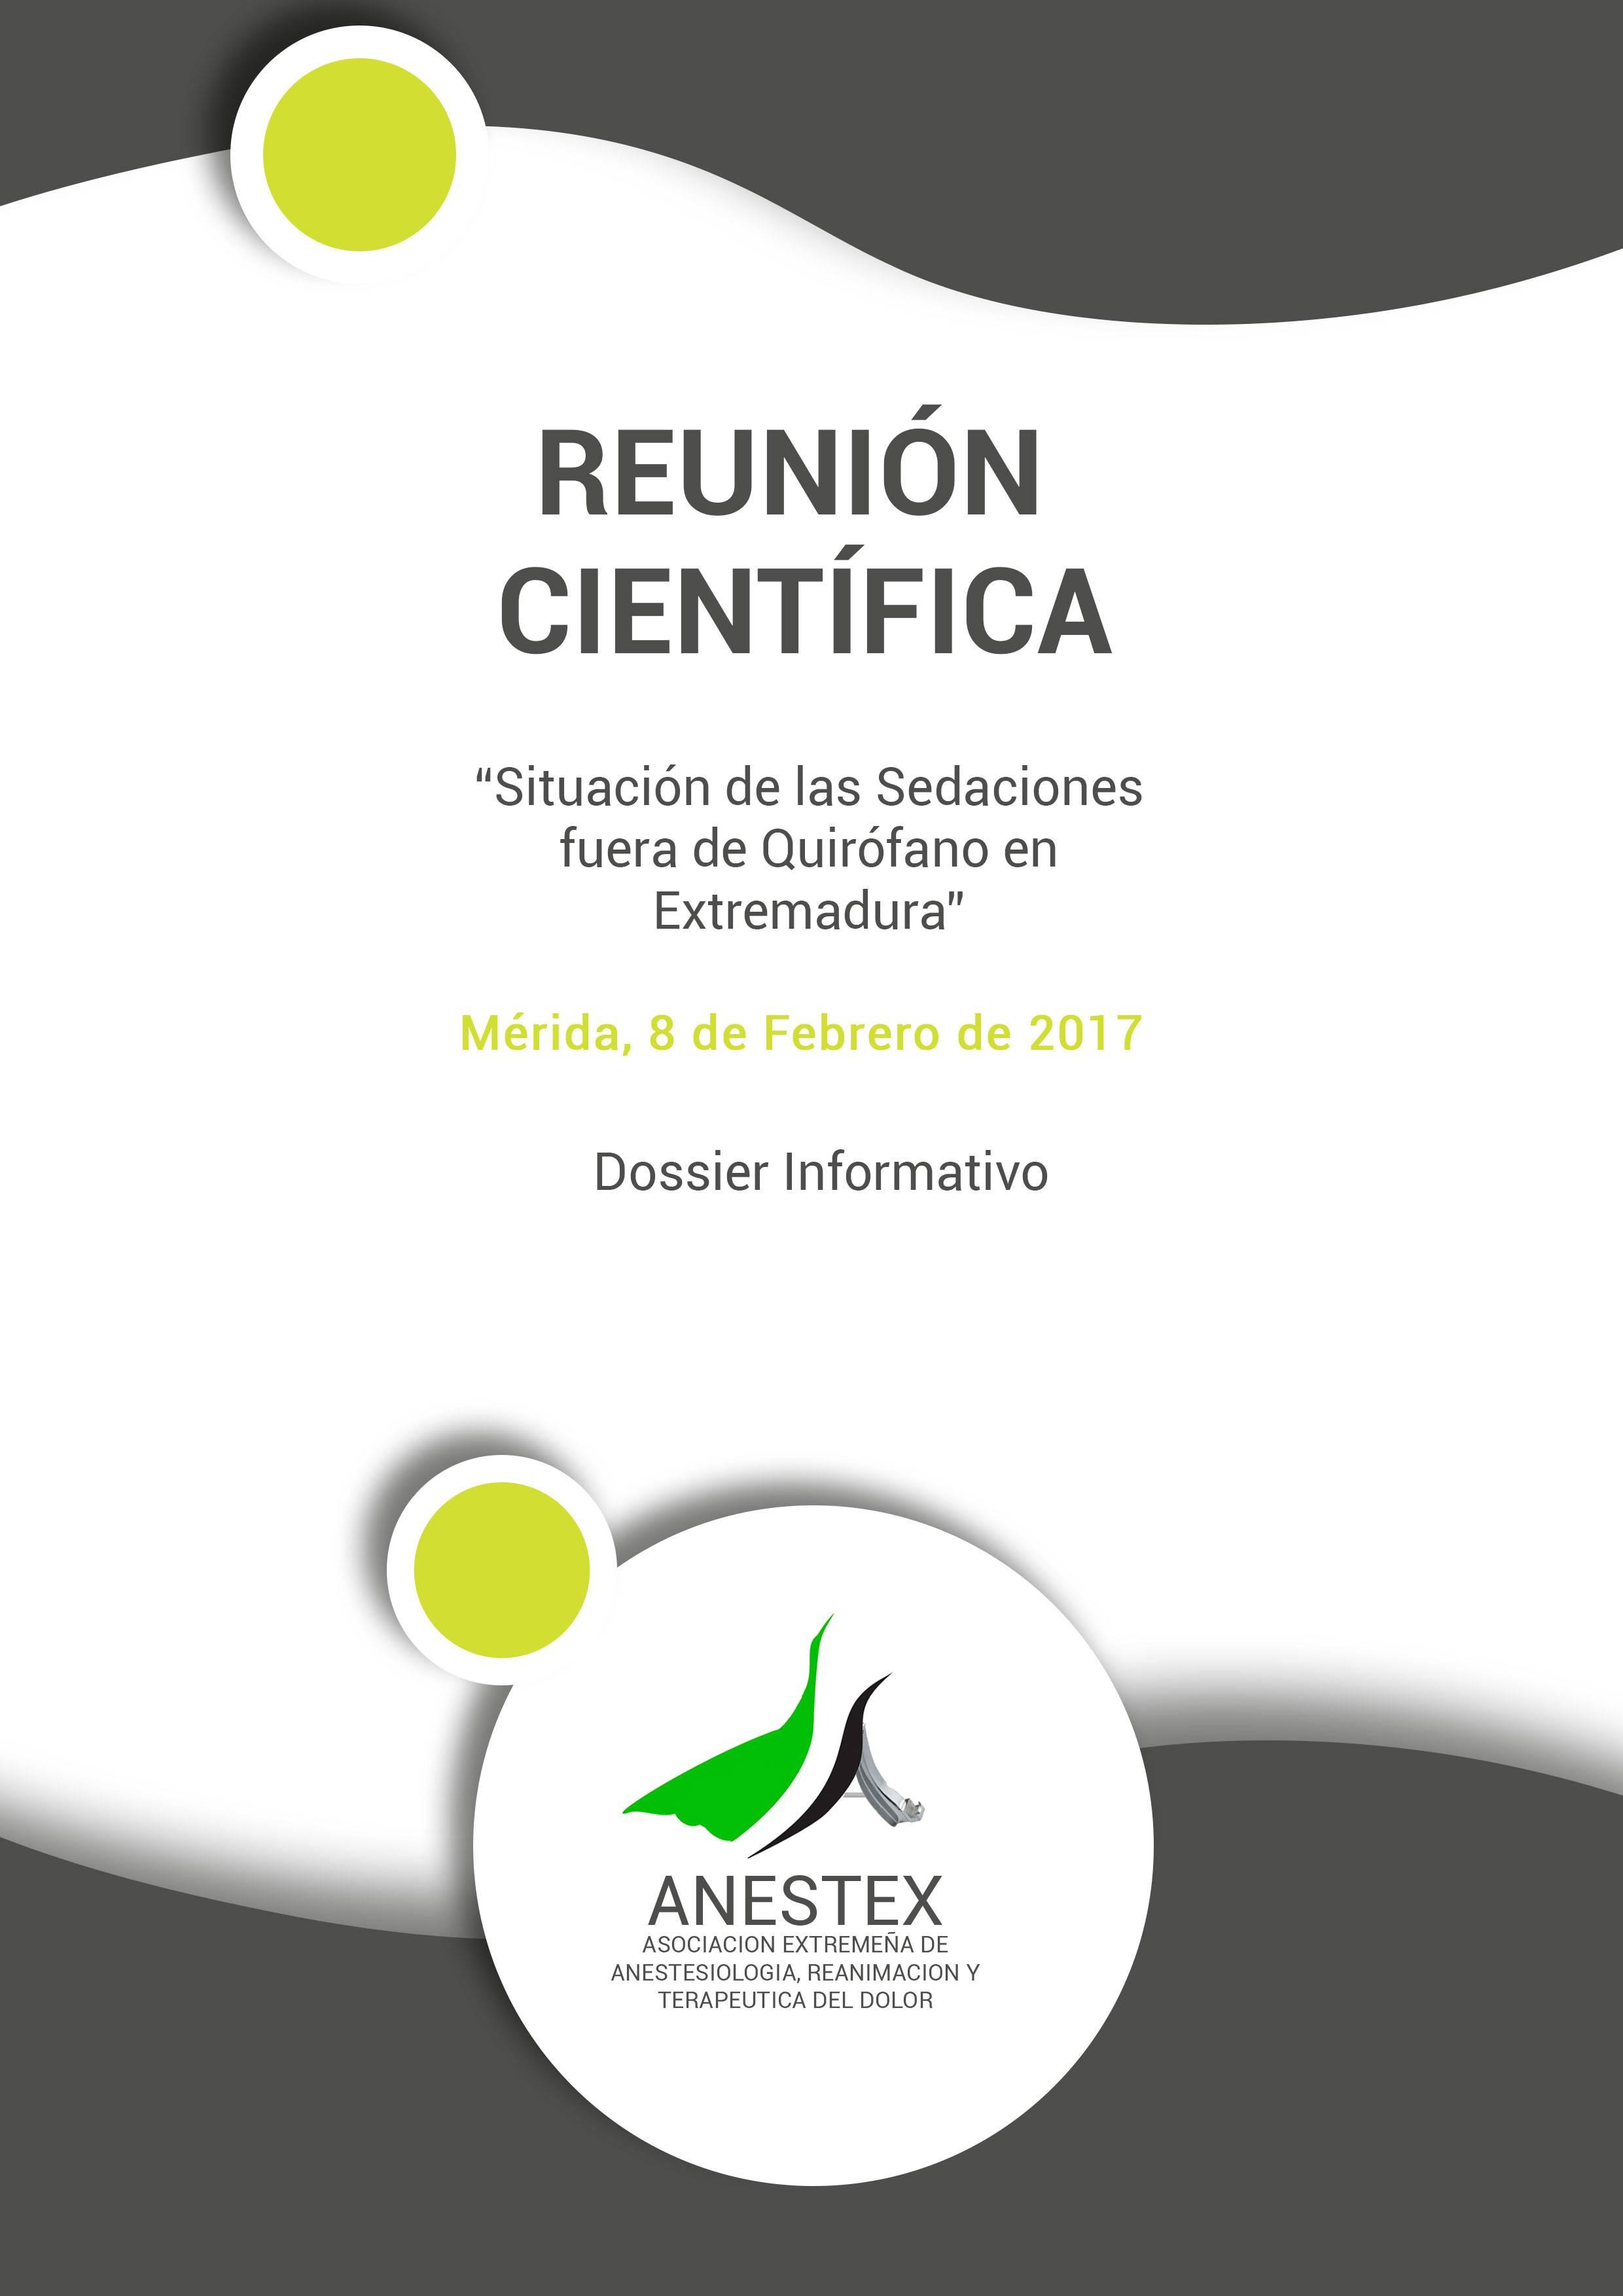 Dossier Informativo Reunión Científica ANESTEX